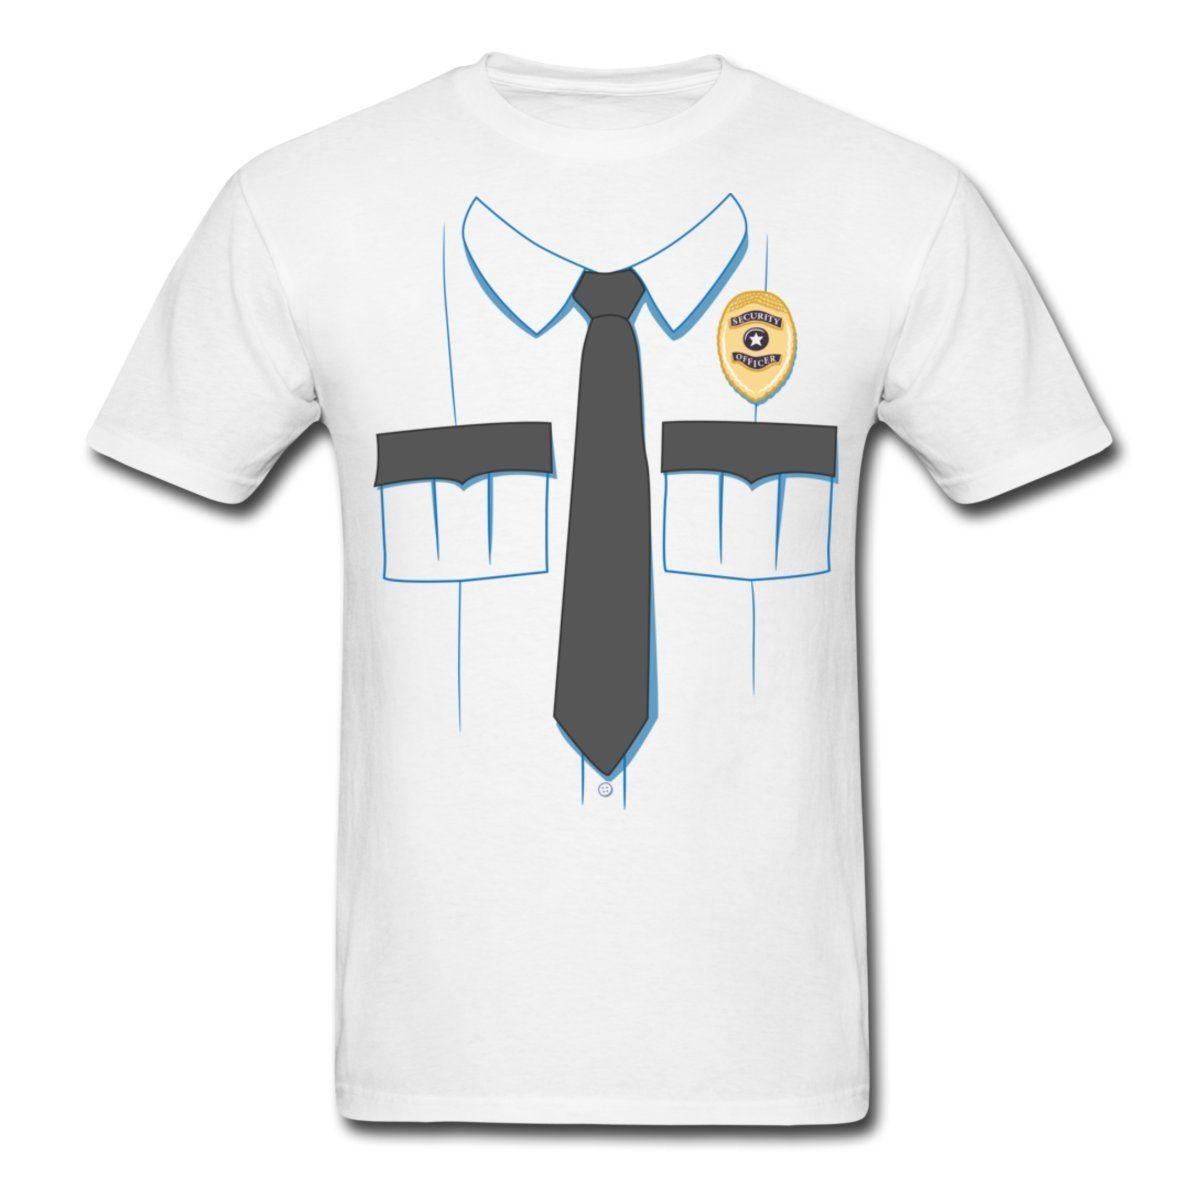 610d88cb Security Guard Uniform Costume Men's T Shirt 100% Cotton Short Sleeve O -  Neck Tops Tee Shirts New Fashion Cool Casual T Shirts